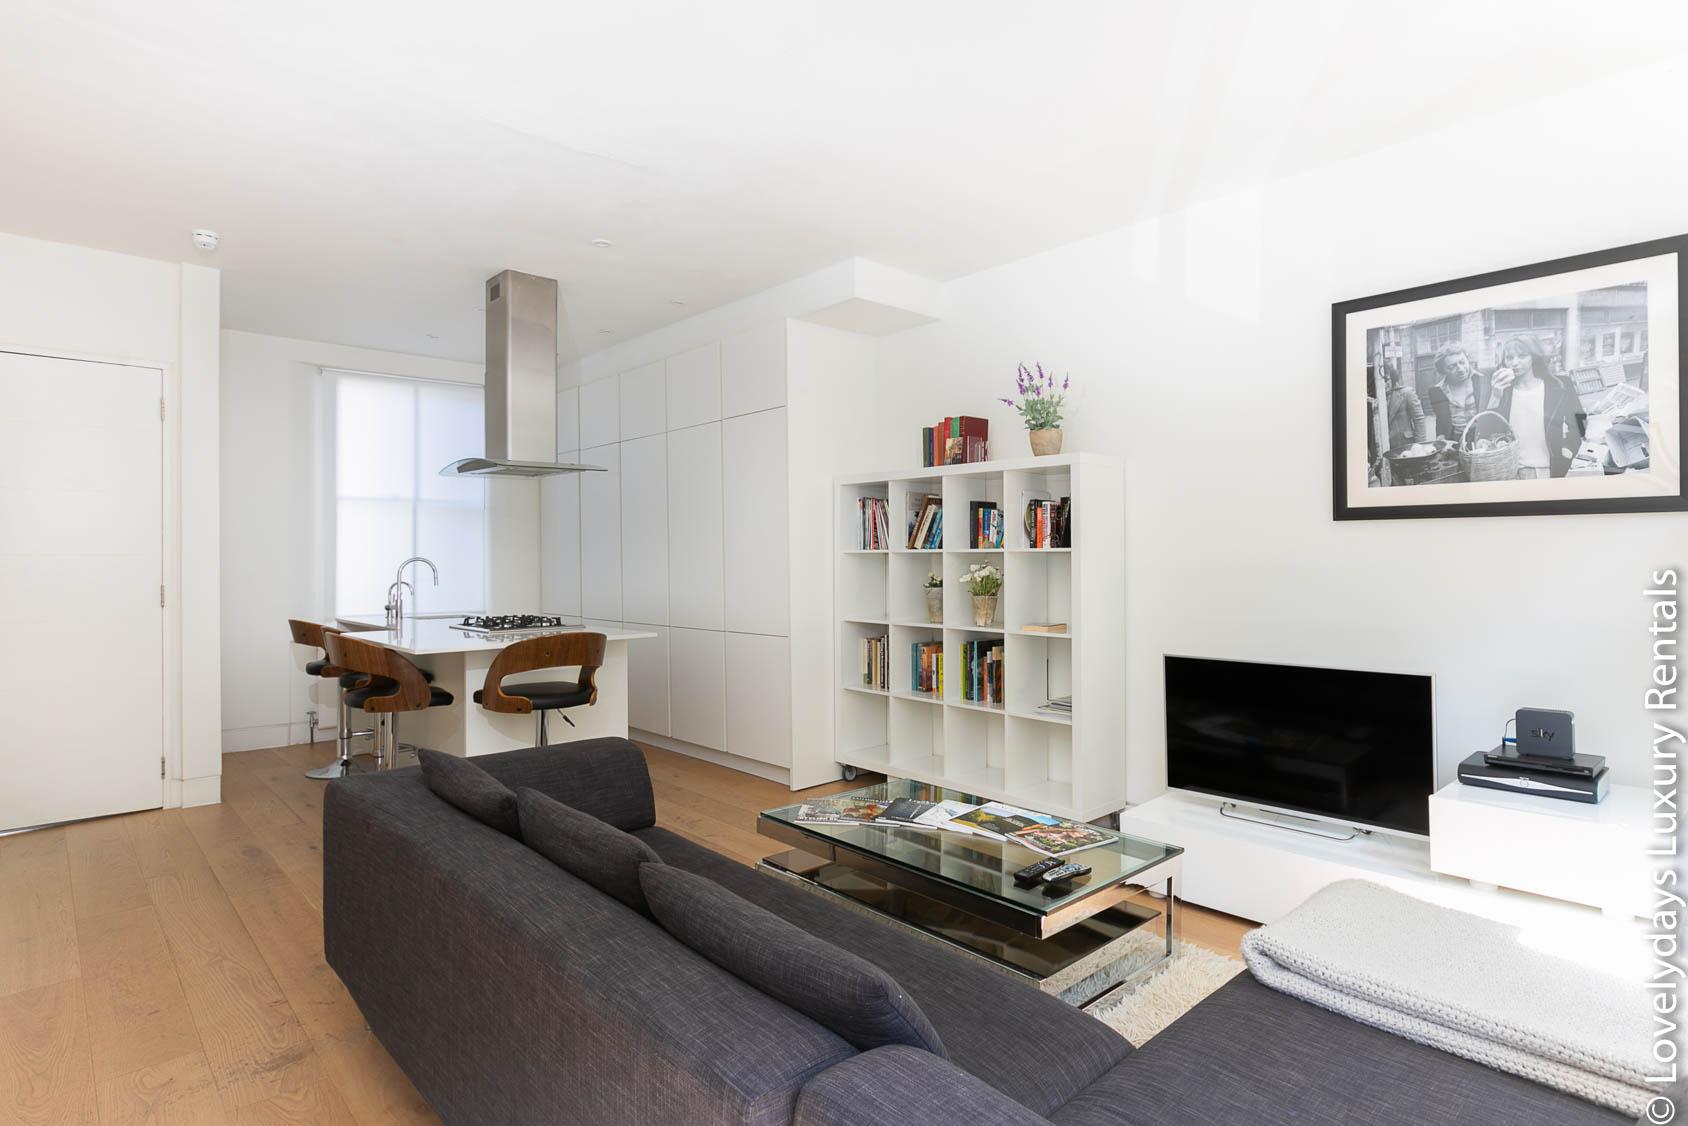 Lovelydays luxury service apartment rental - London - Fitzrovia - Foley Street - Lovelysuite - 2 bedrooms - 2 bathrooms - Luxury living room - 61372de1fc7c - Lovelydays